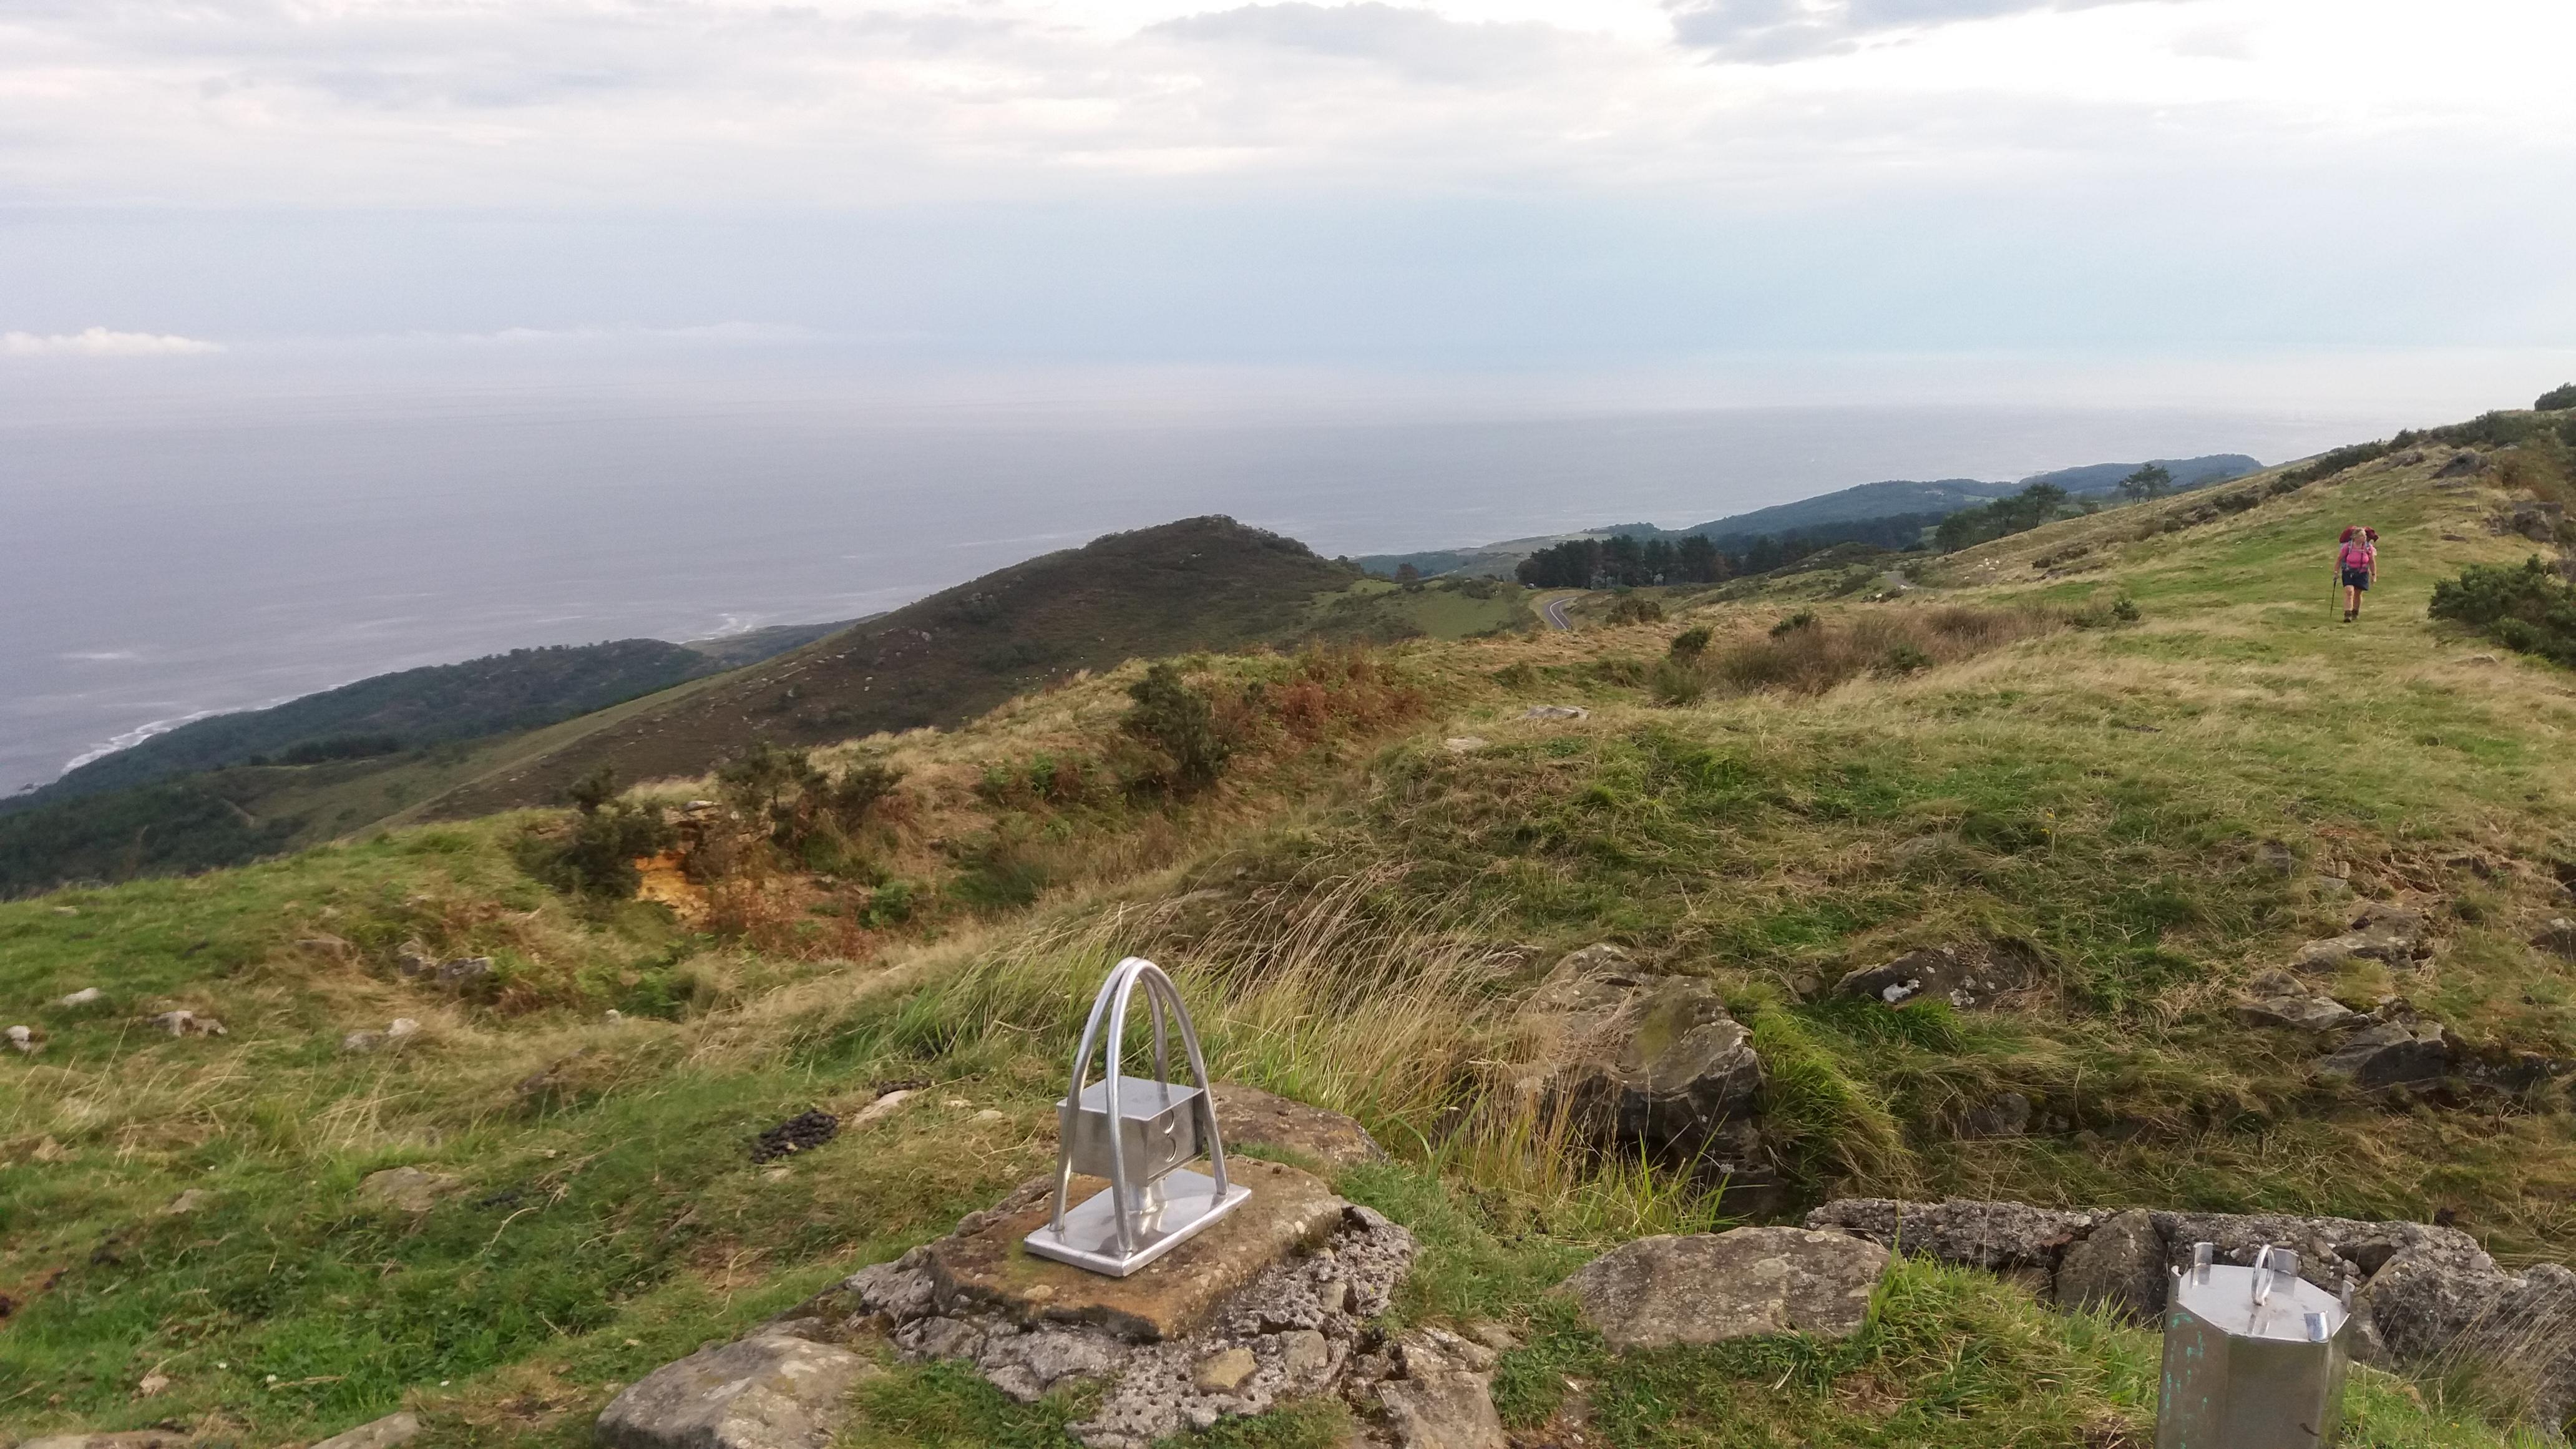 View of the Bay of Biscay from Jaizkibel